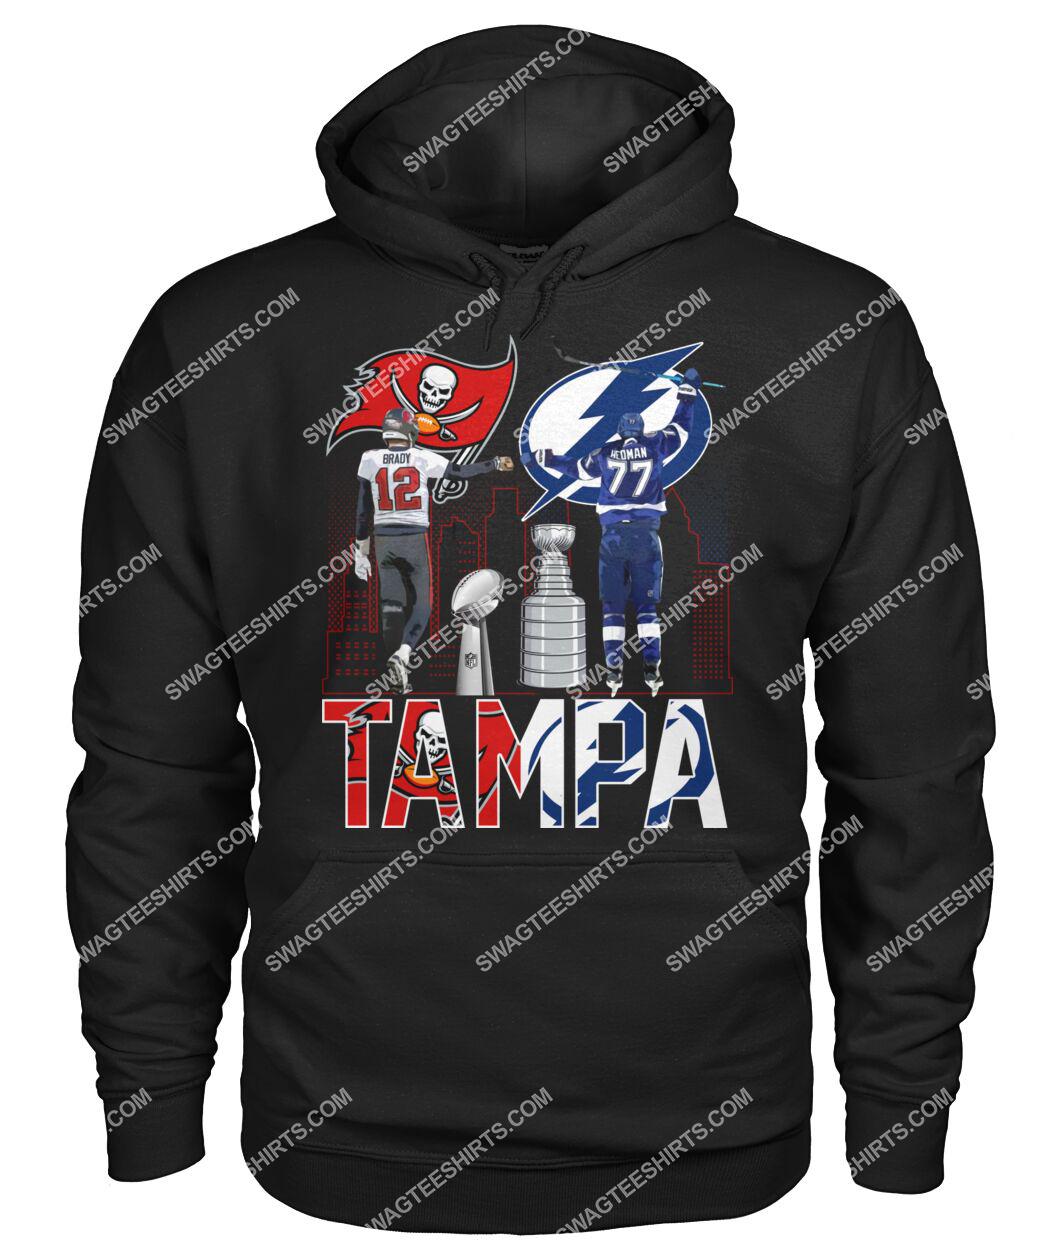 tampa bay buccaneers and tampa bay lightning hoodie 1